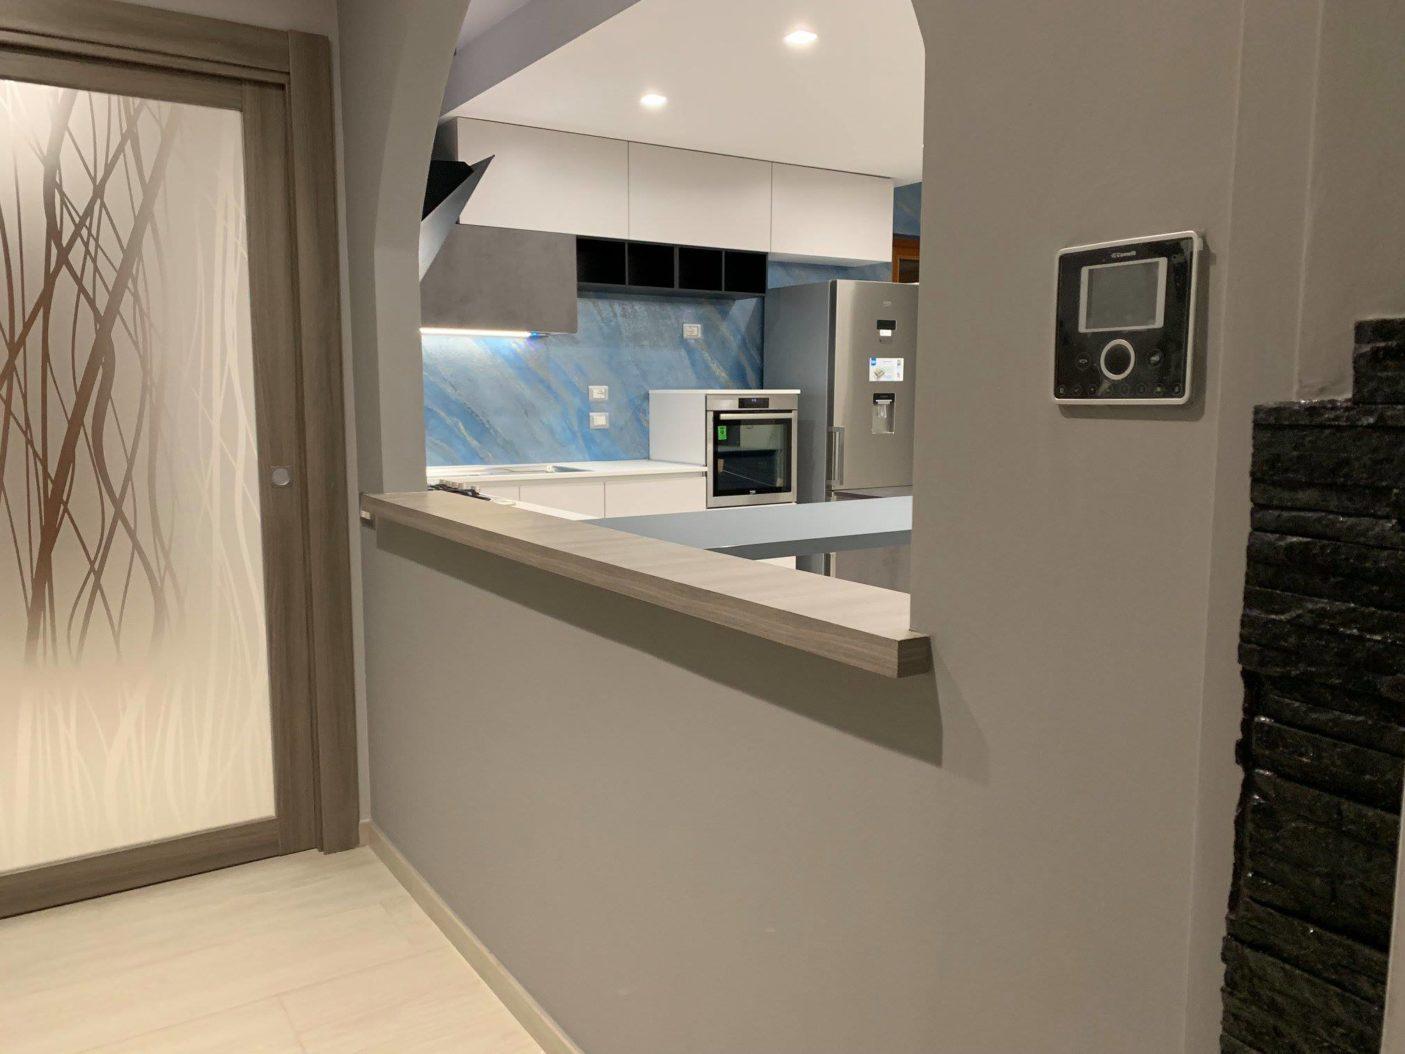 Cucina-Creo-Kitchens-Tablet-dekton-Cosentino4.jpg